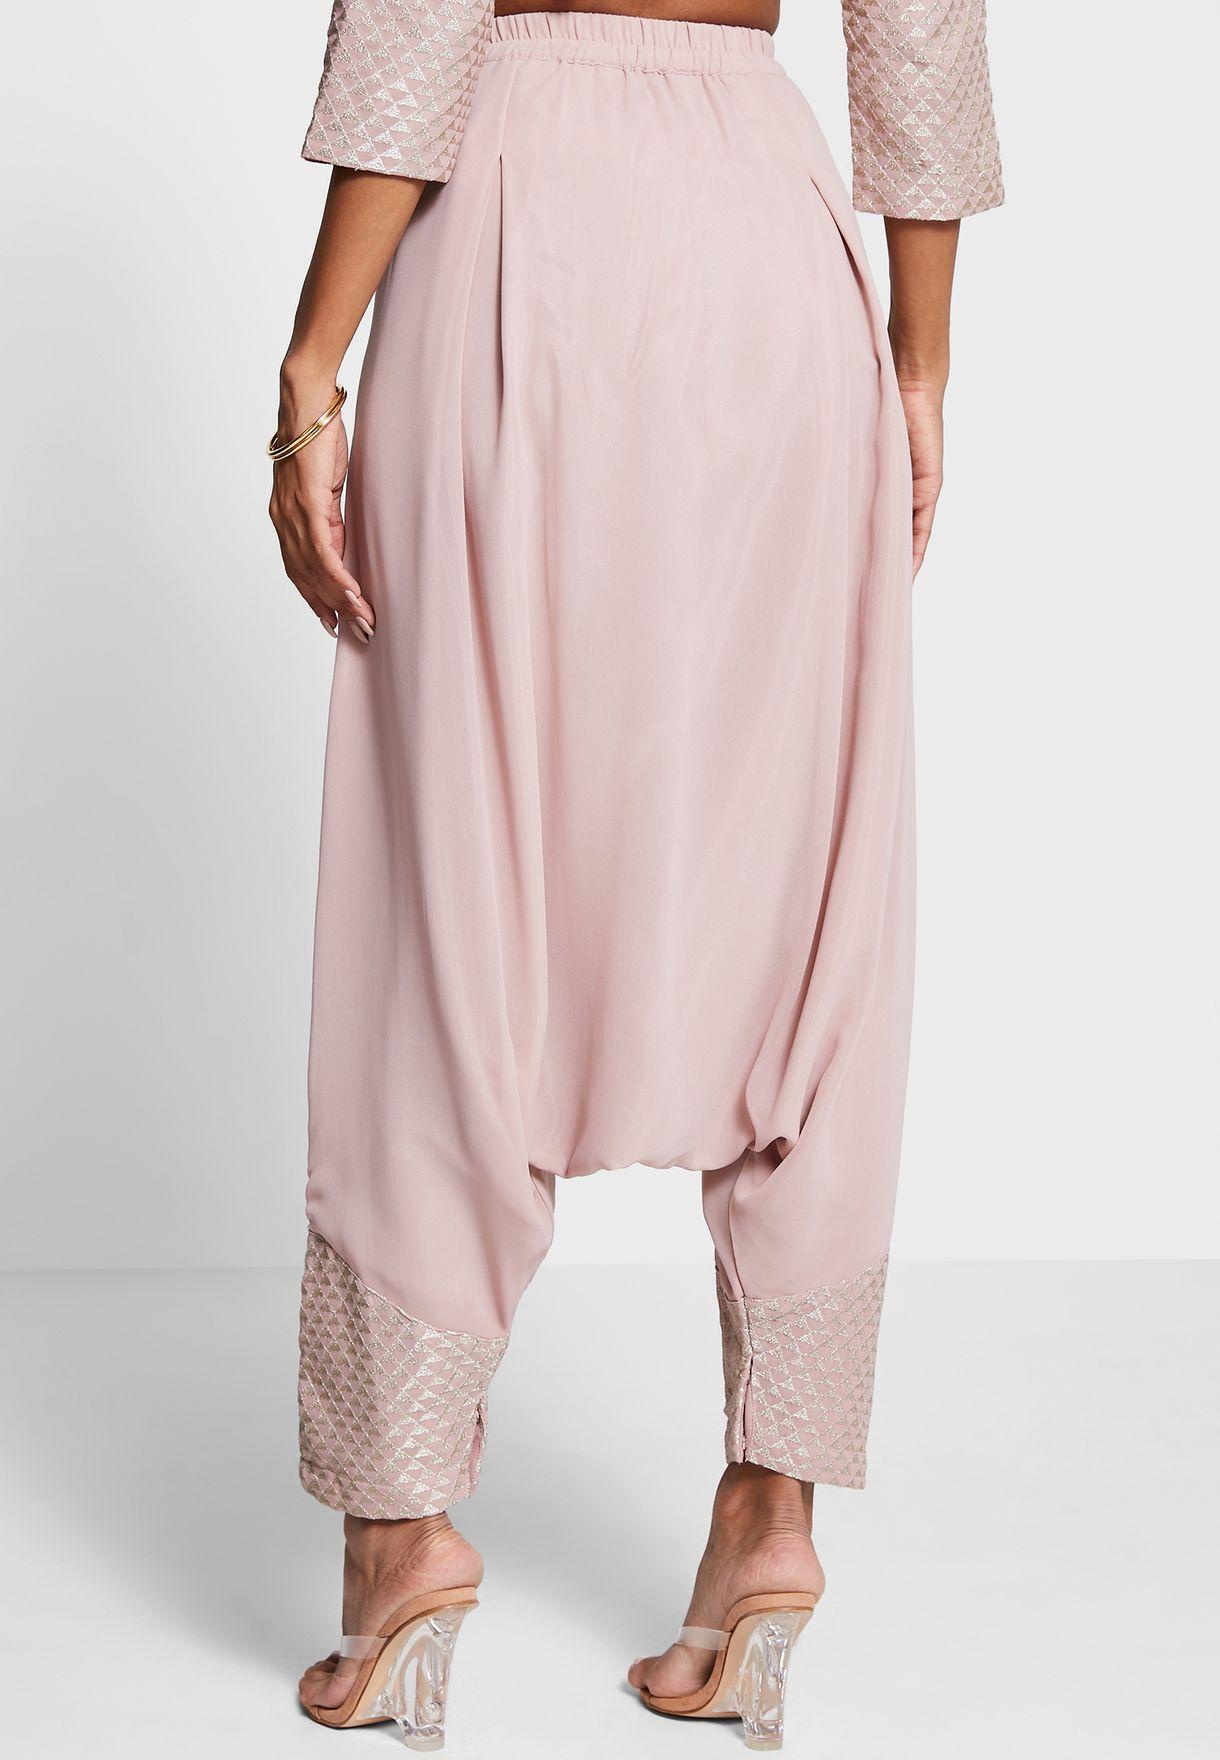 Indya X Payal Singhal Blush Embroidered Cuff Dhoti Pants